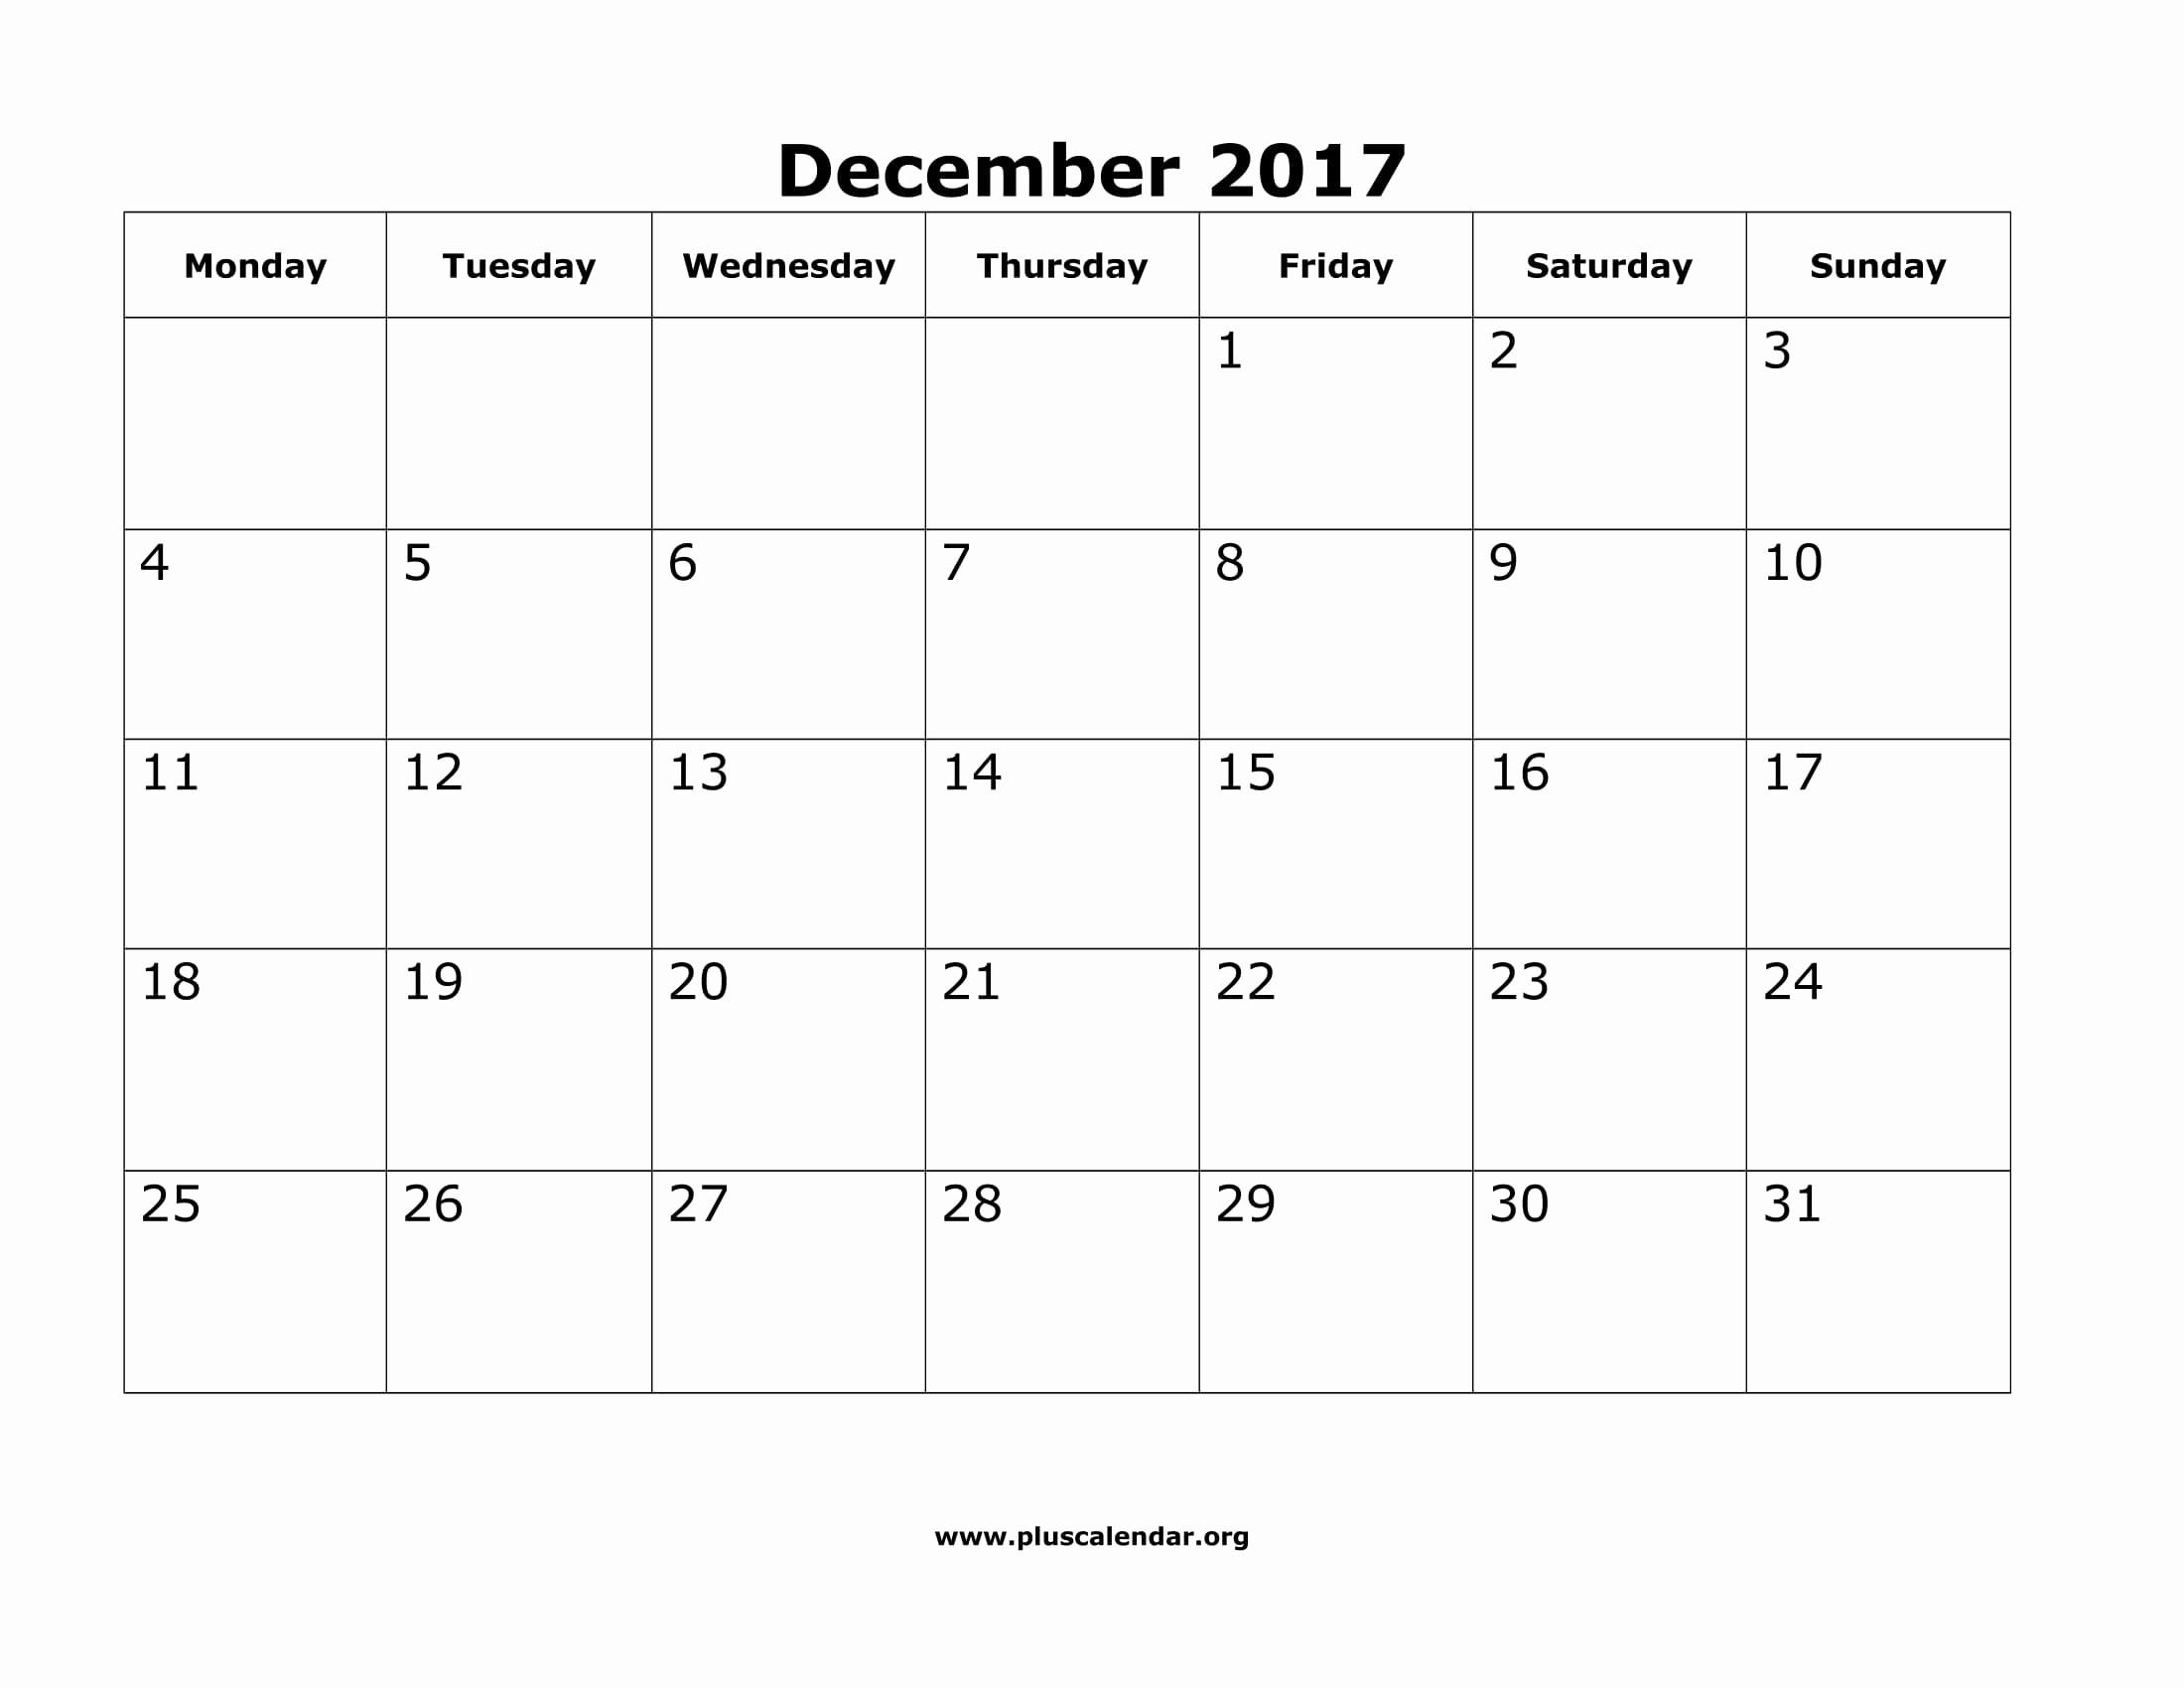 Monday Through Sunday Calendar Template Inspirational November 2018 Monday Through Sunday – Template Calendar Design